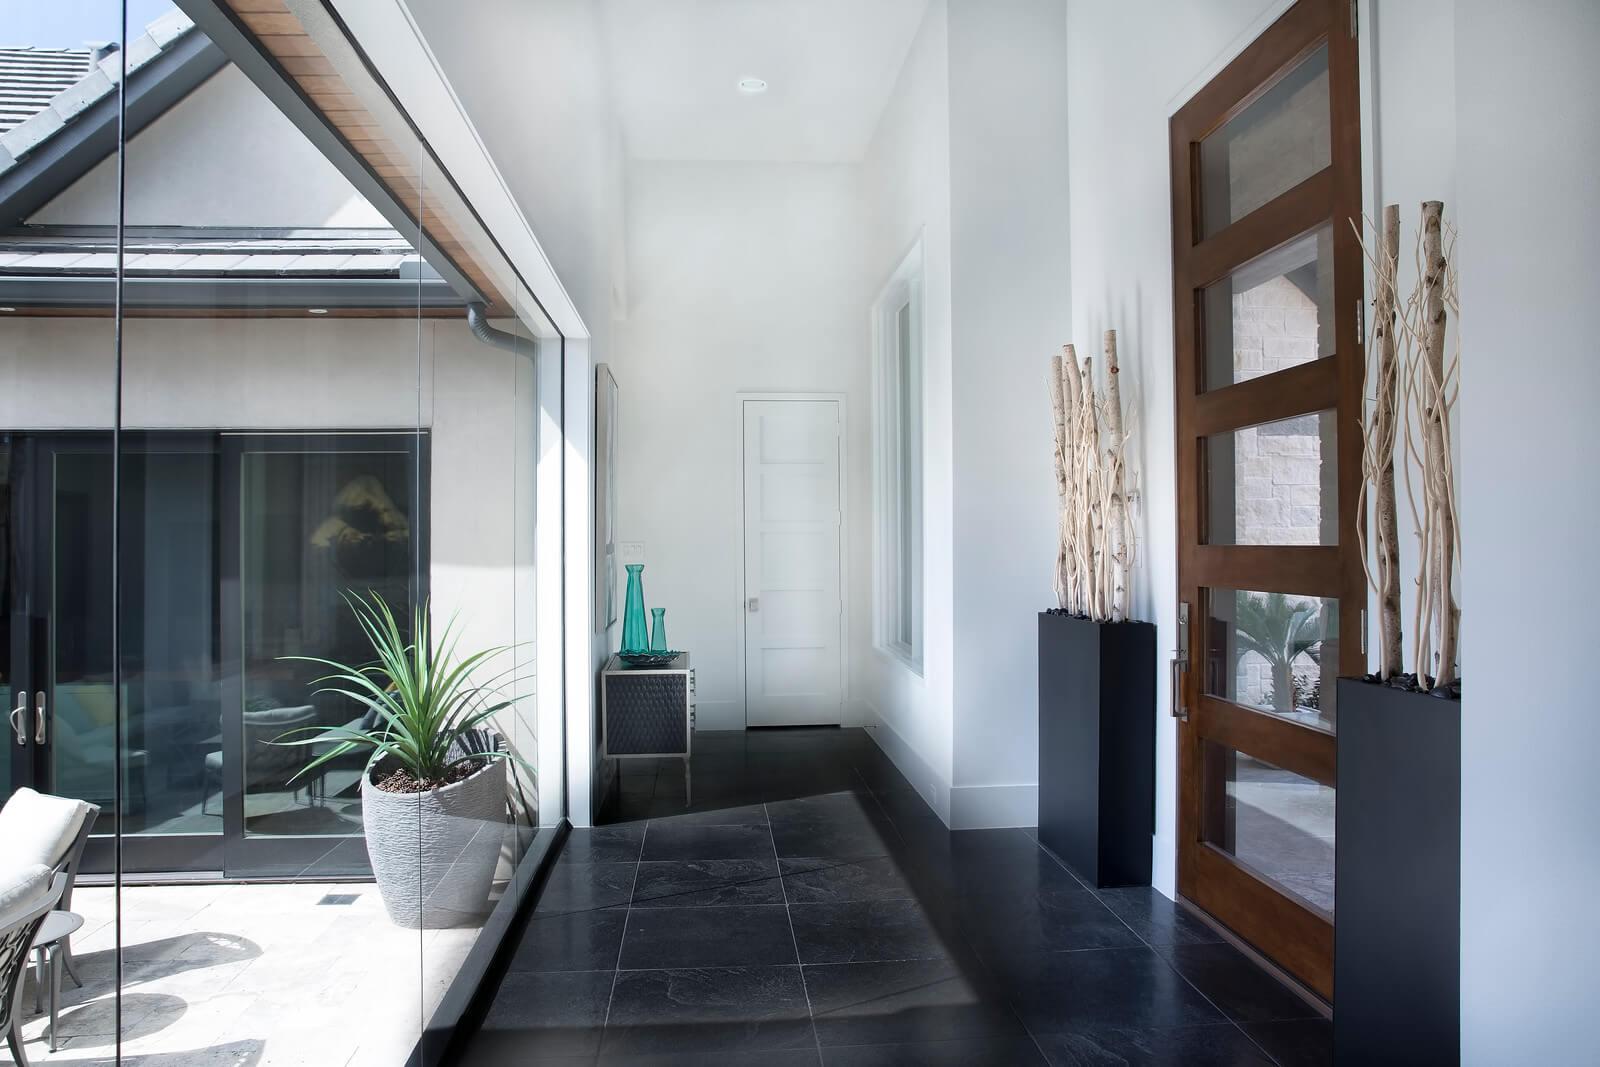 Interiors & Exteriors • Veranda Designer Homes • Luxury Custom Home ...